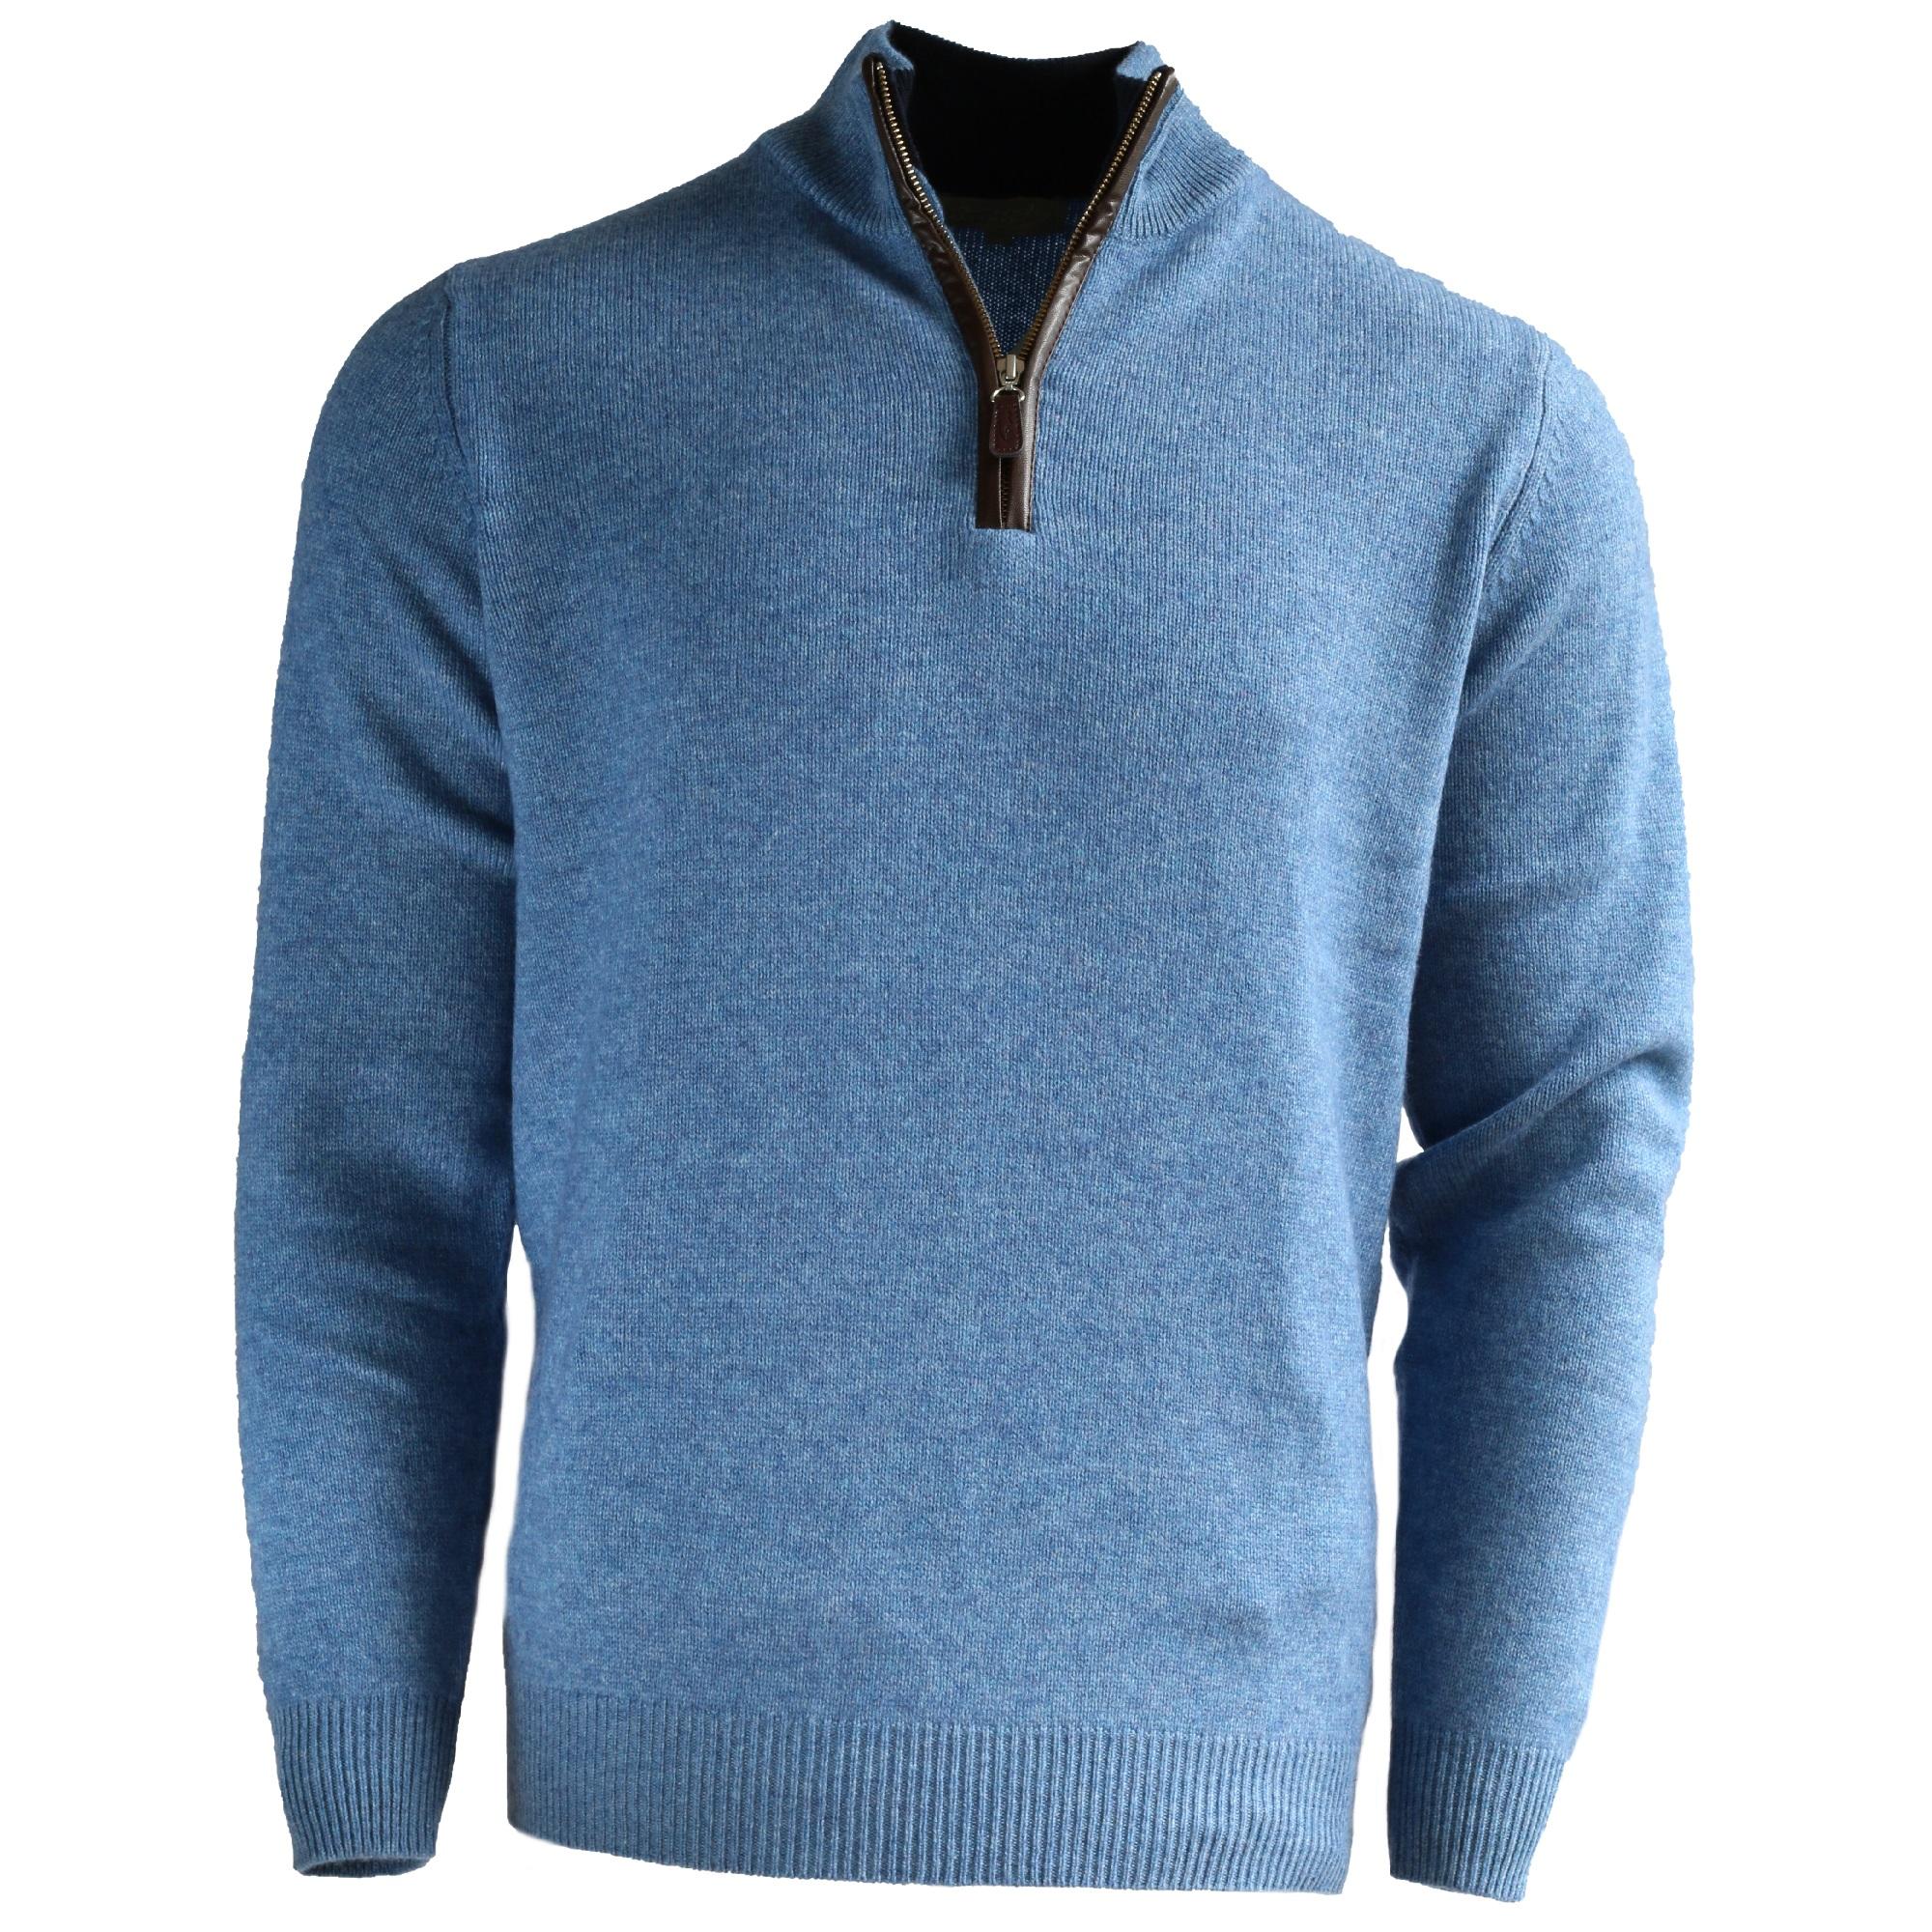 Men's Zip Neck Jumper – Marine Blue